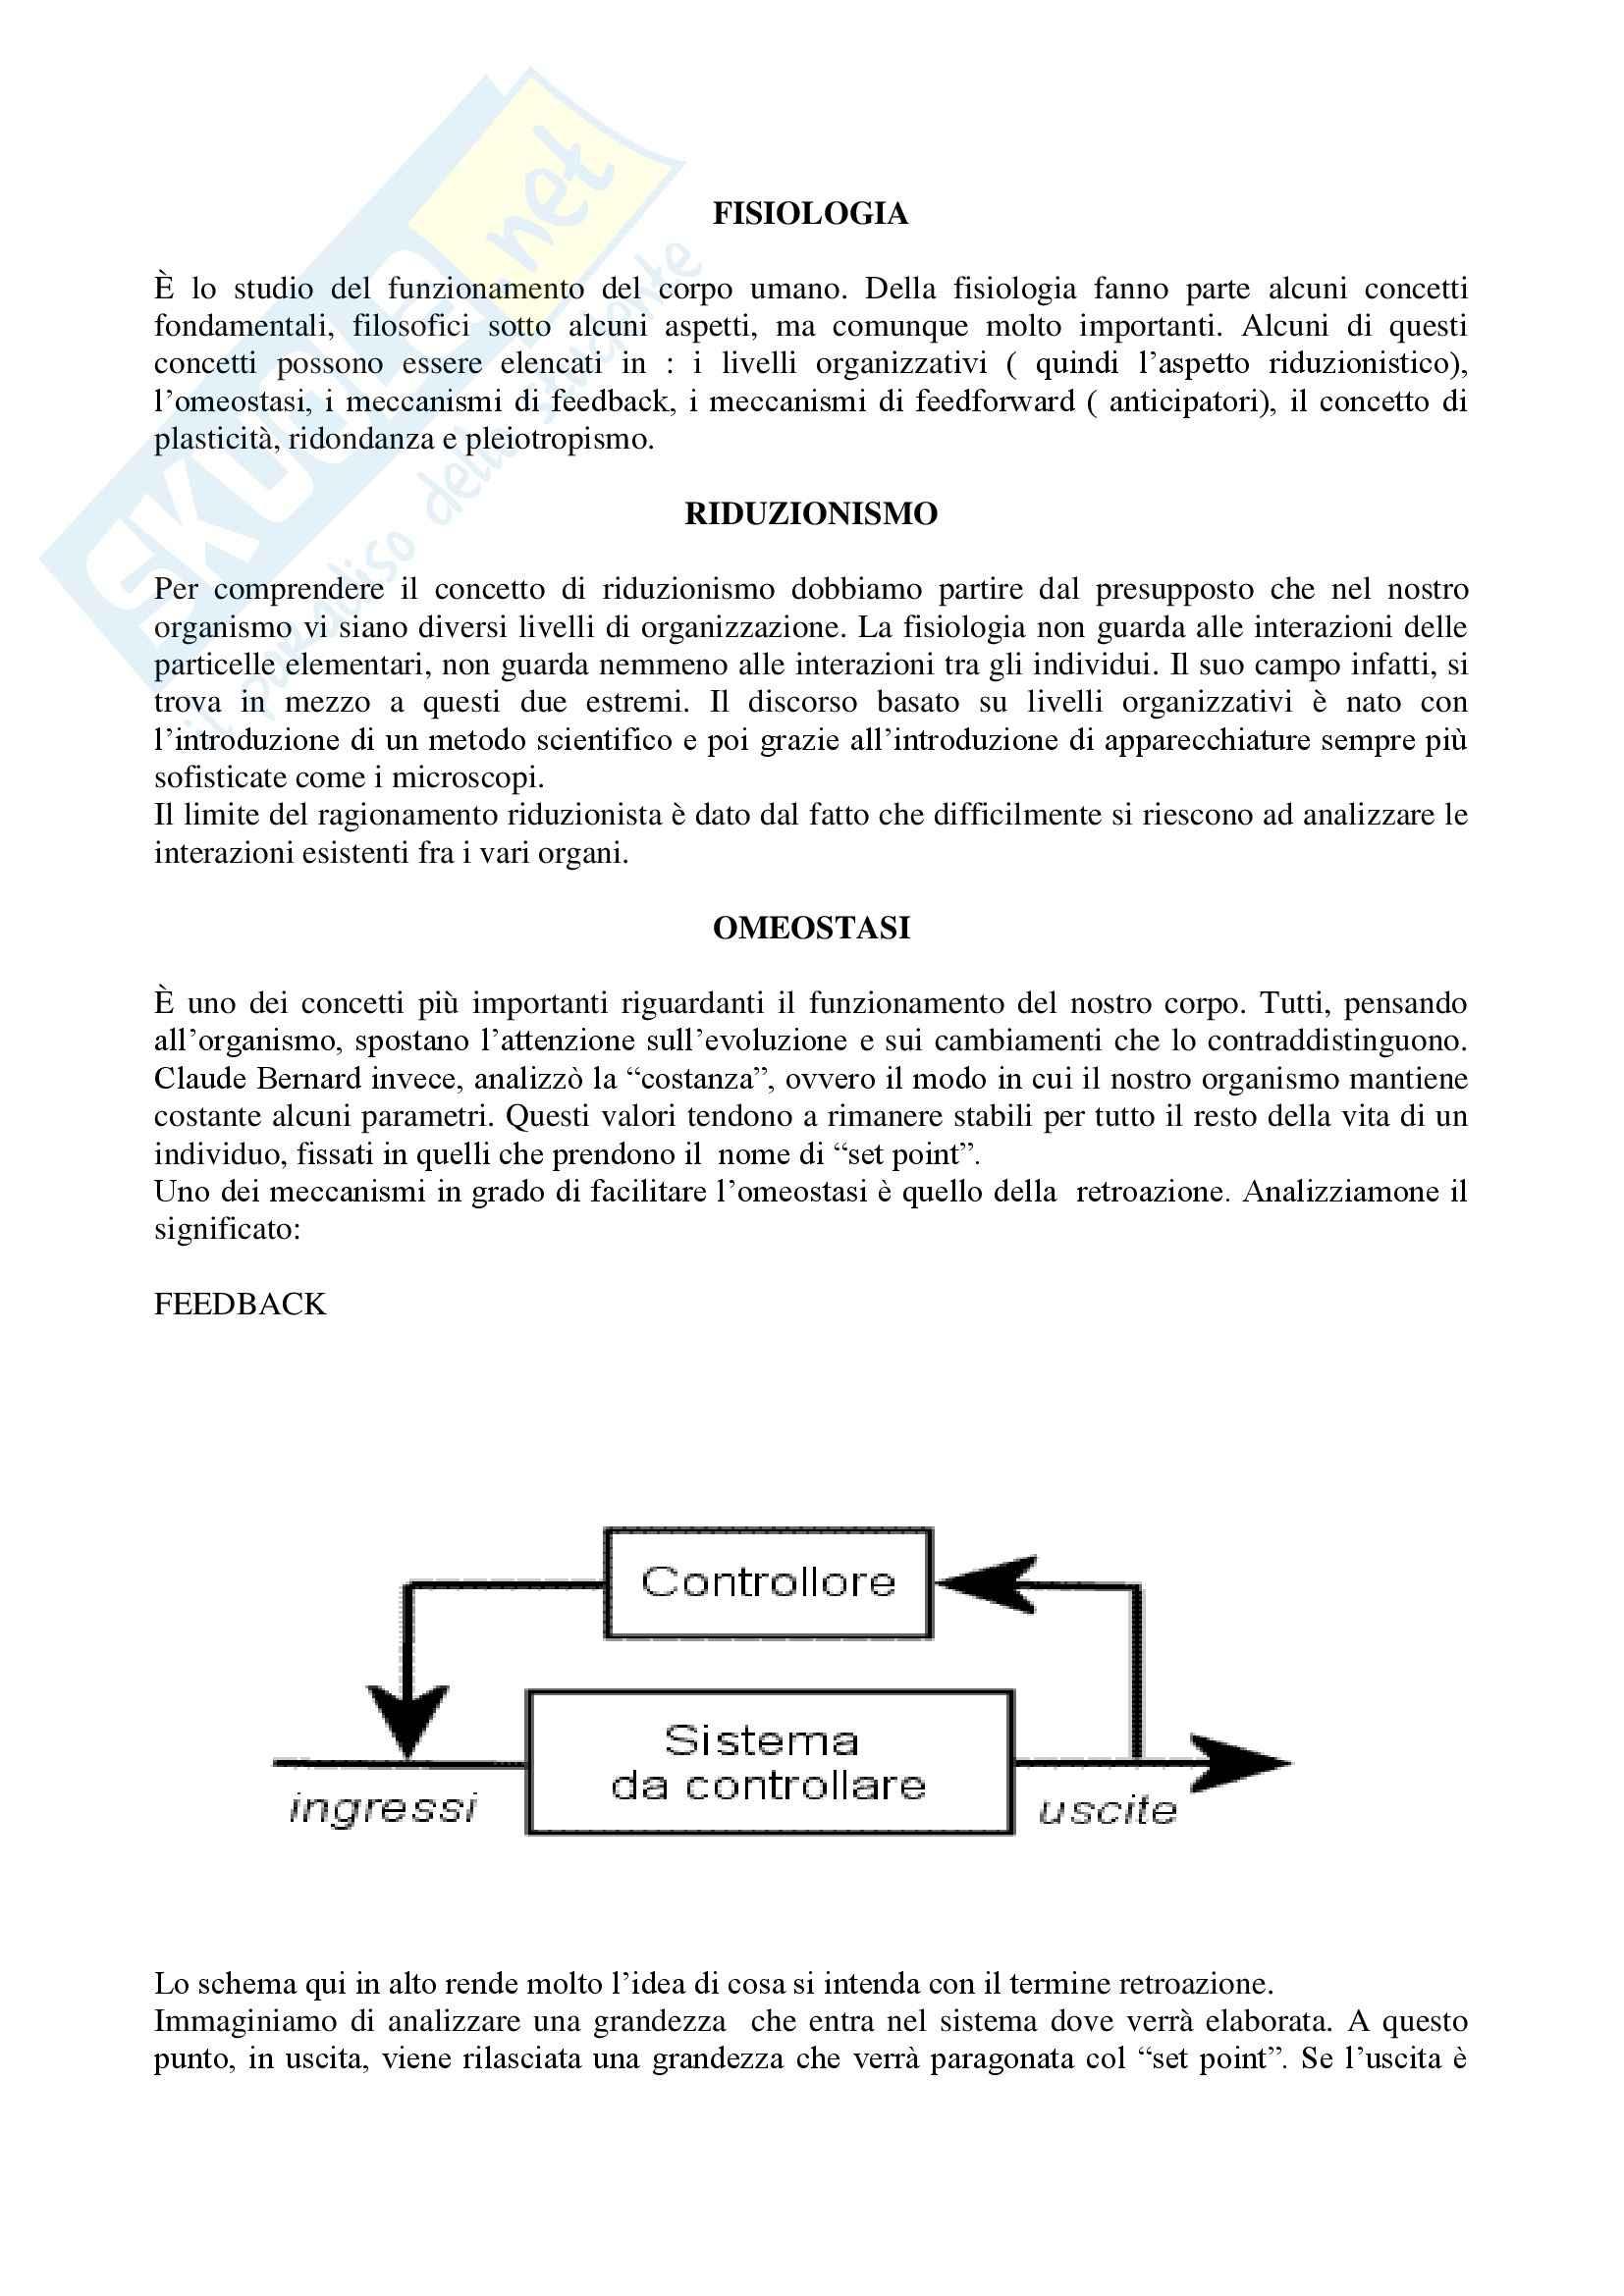 Fisiologia I - Introduzione alla fisiologia